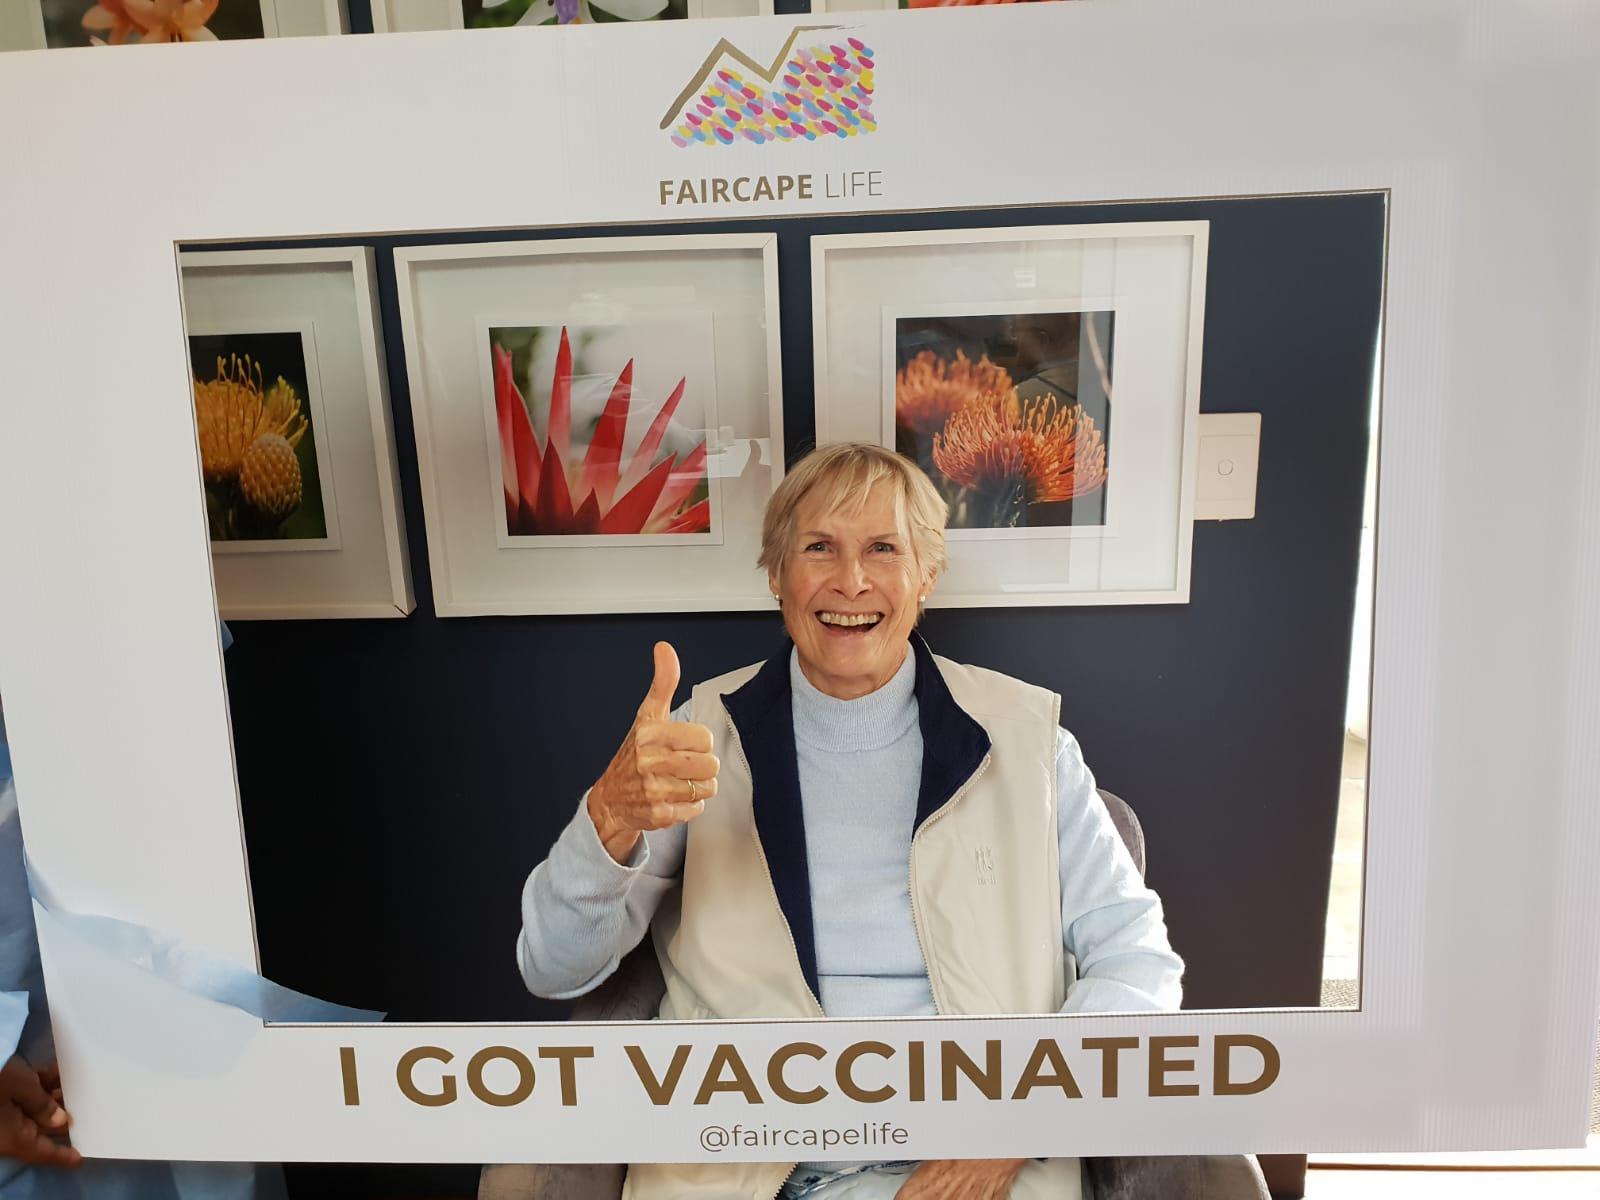 Faircape Life: All 6 Estates are Vaccinated Retirement Villages